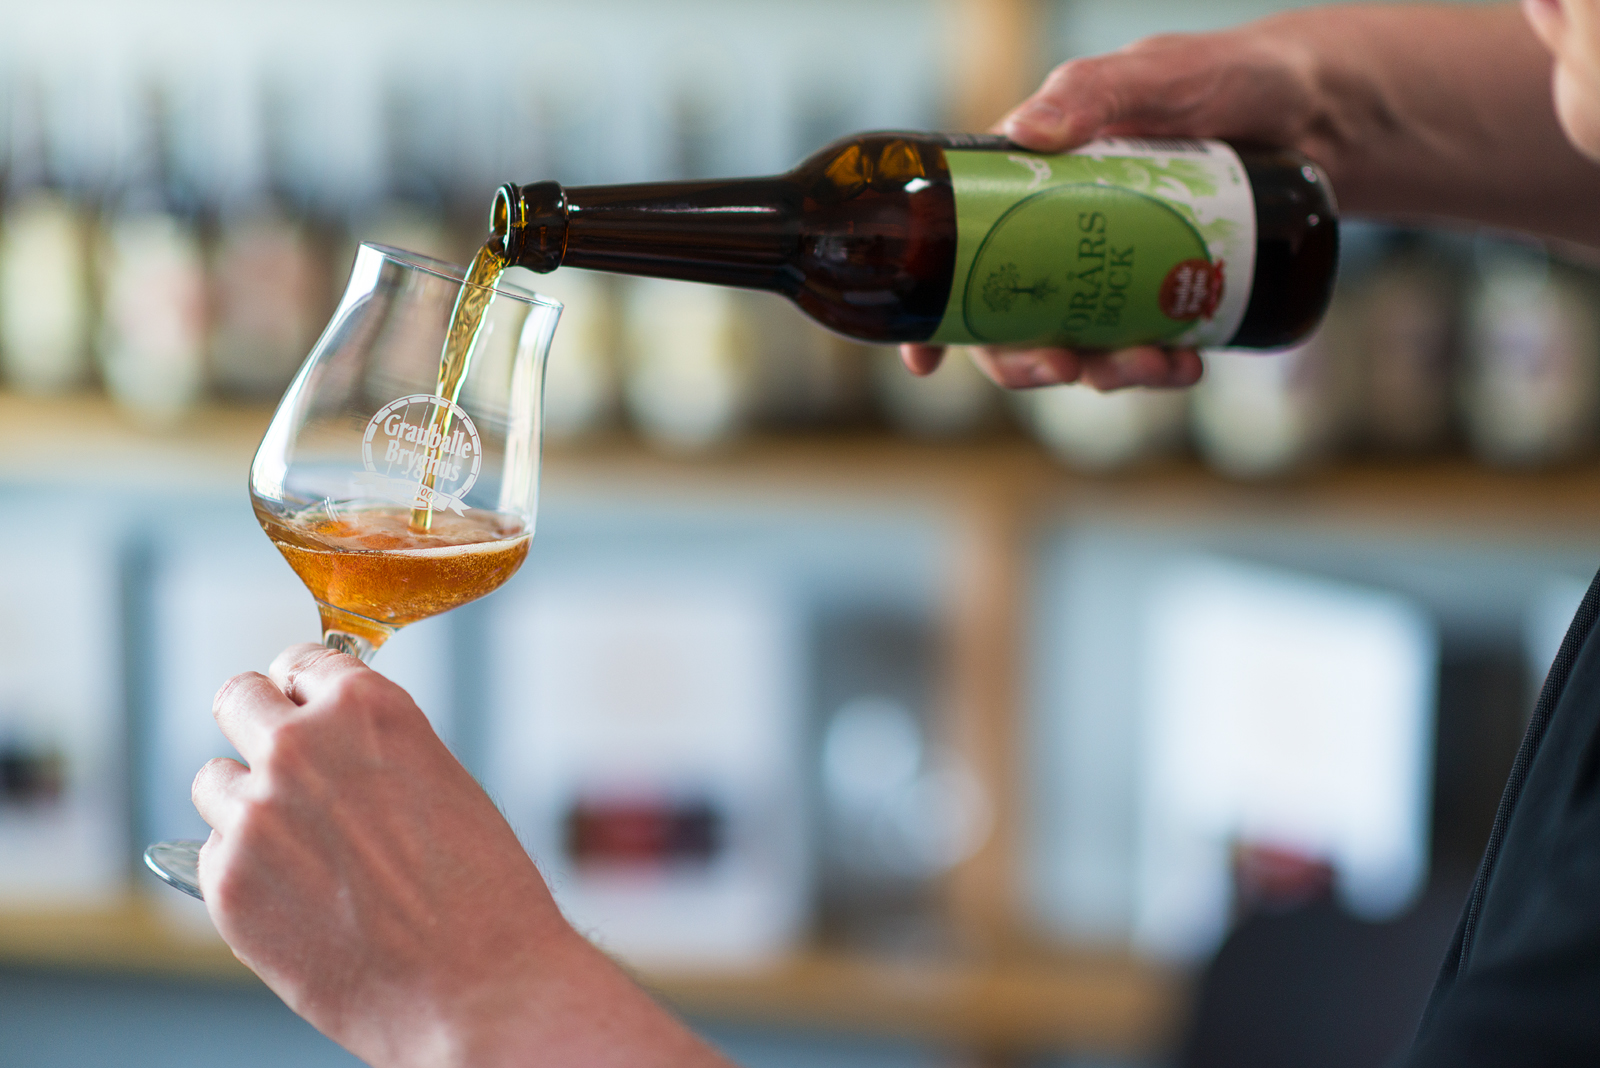 Ølsmagning og rundvisning hos Grauballe Bryghus